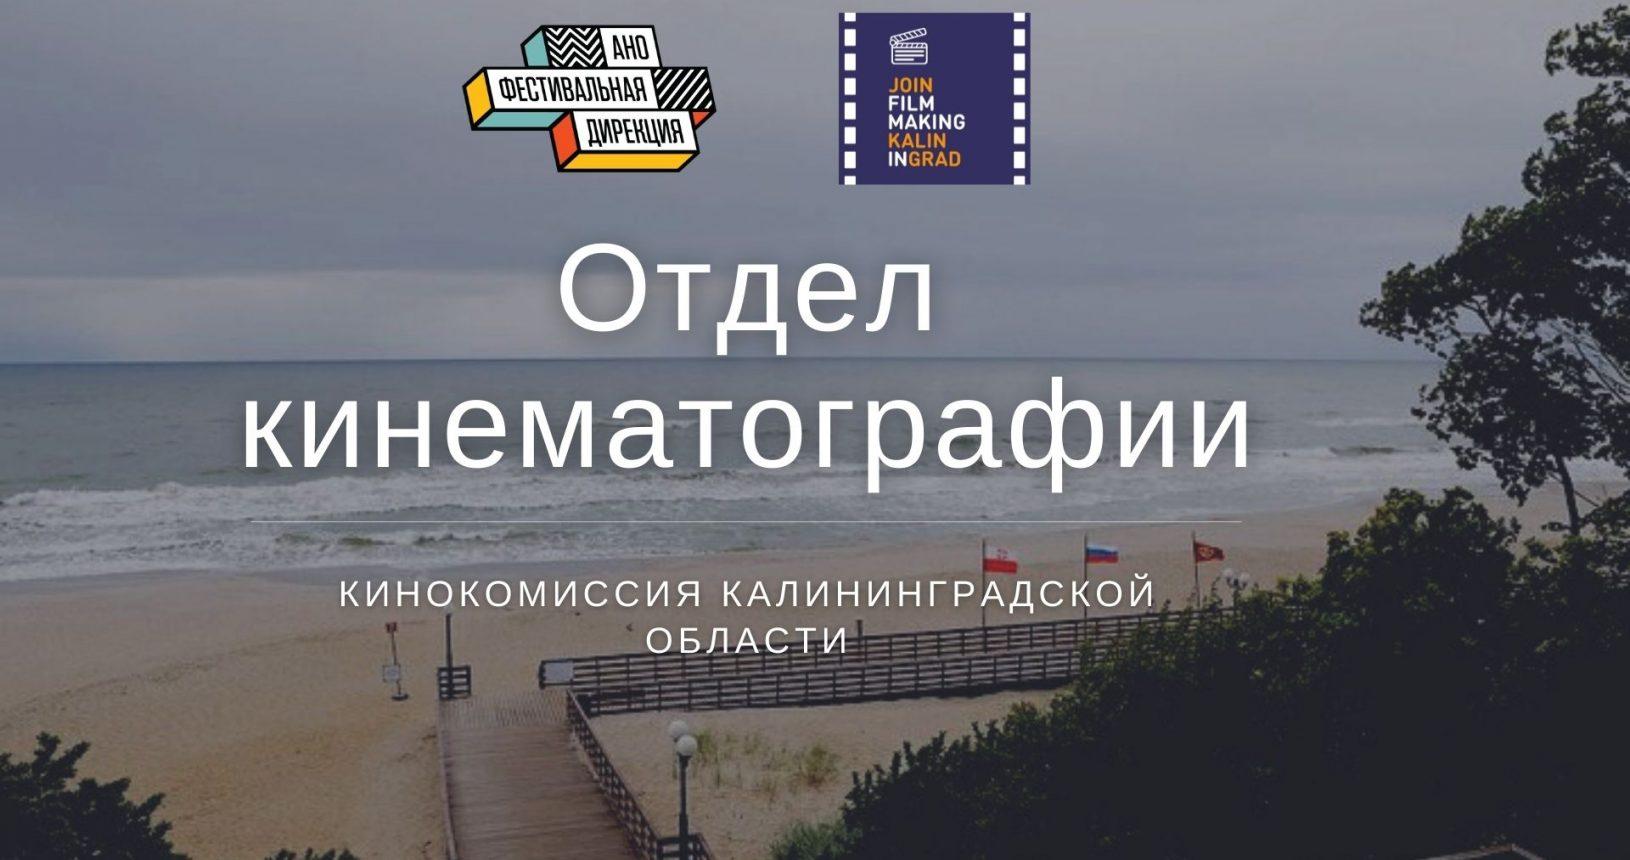 кинокомиссия калининград